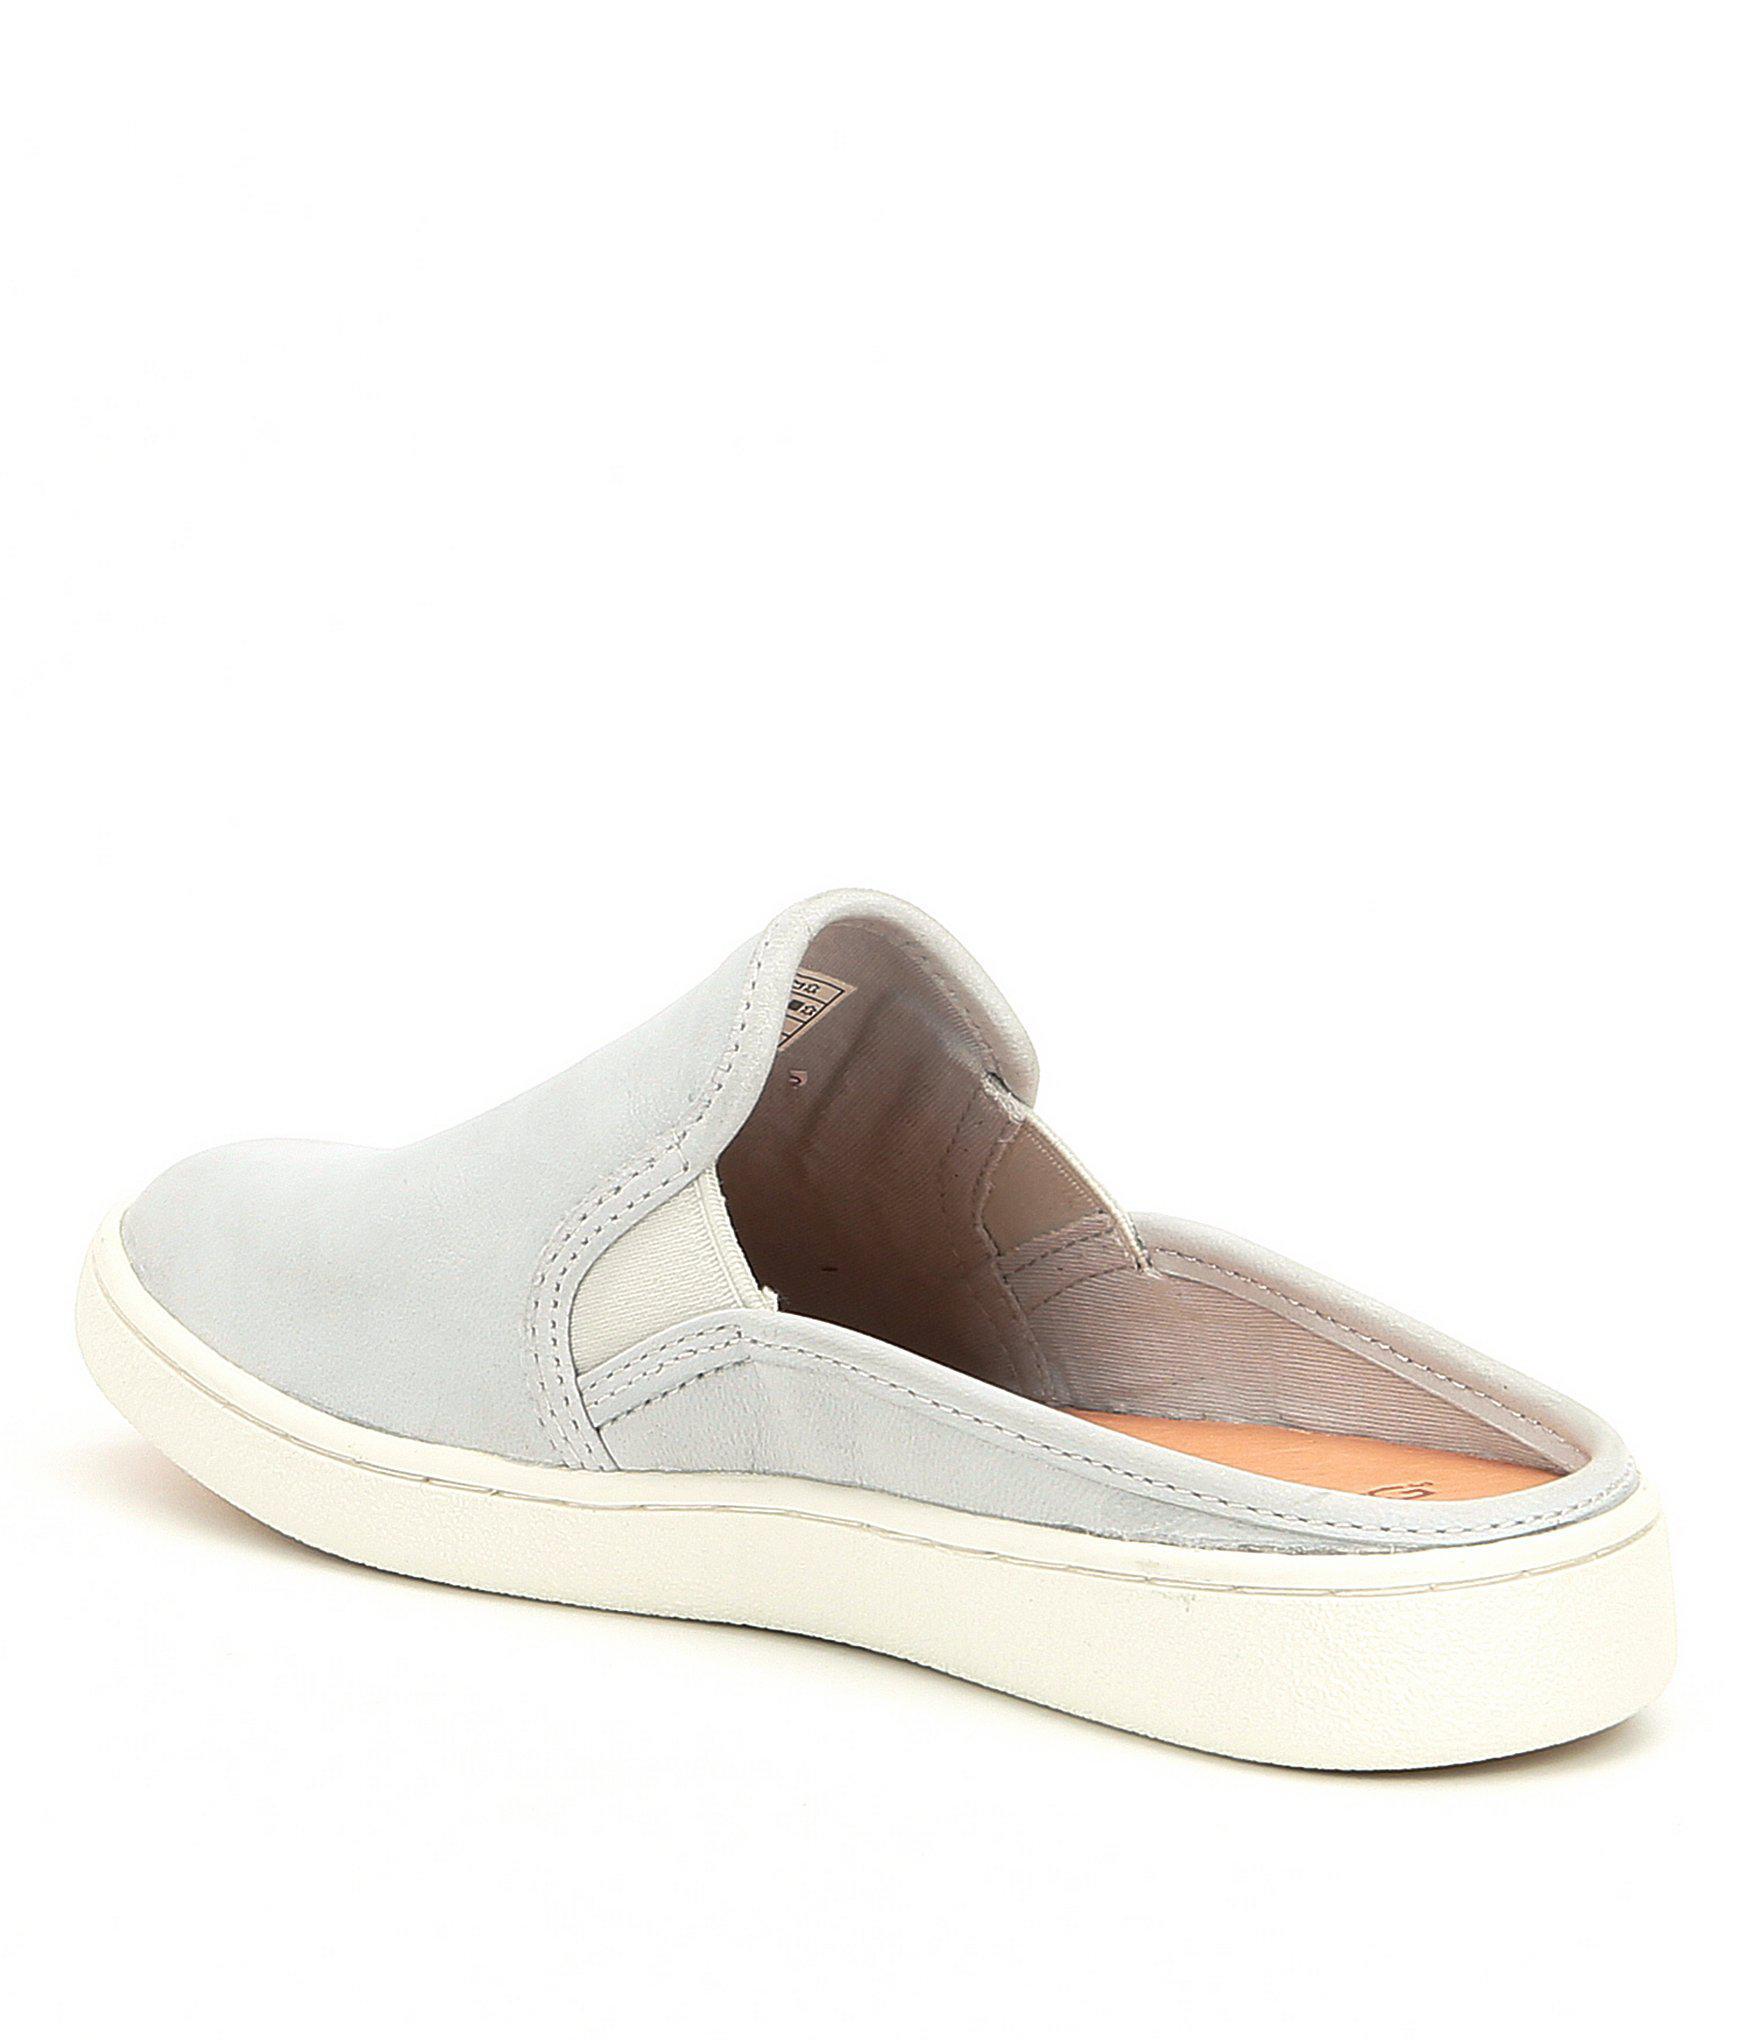 7a73d768be63 Ugg - Gray Gene Nubuck Slide Sneakers - Lyst. View fullscreen